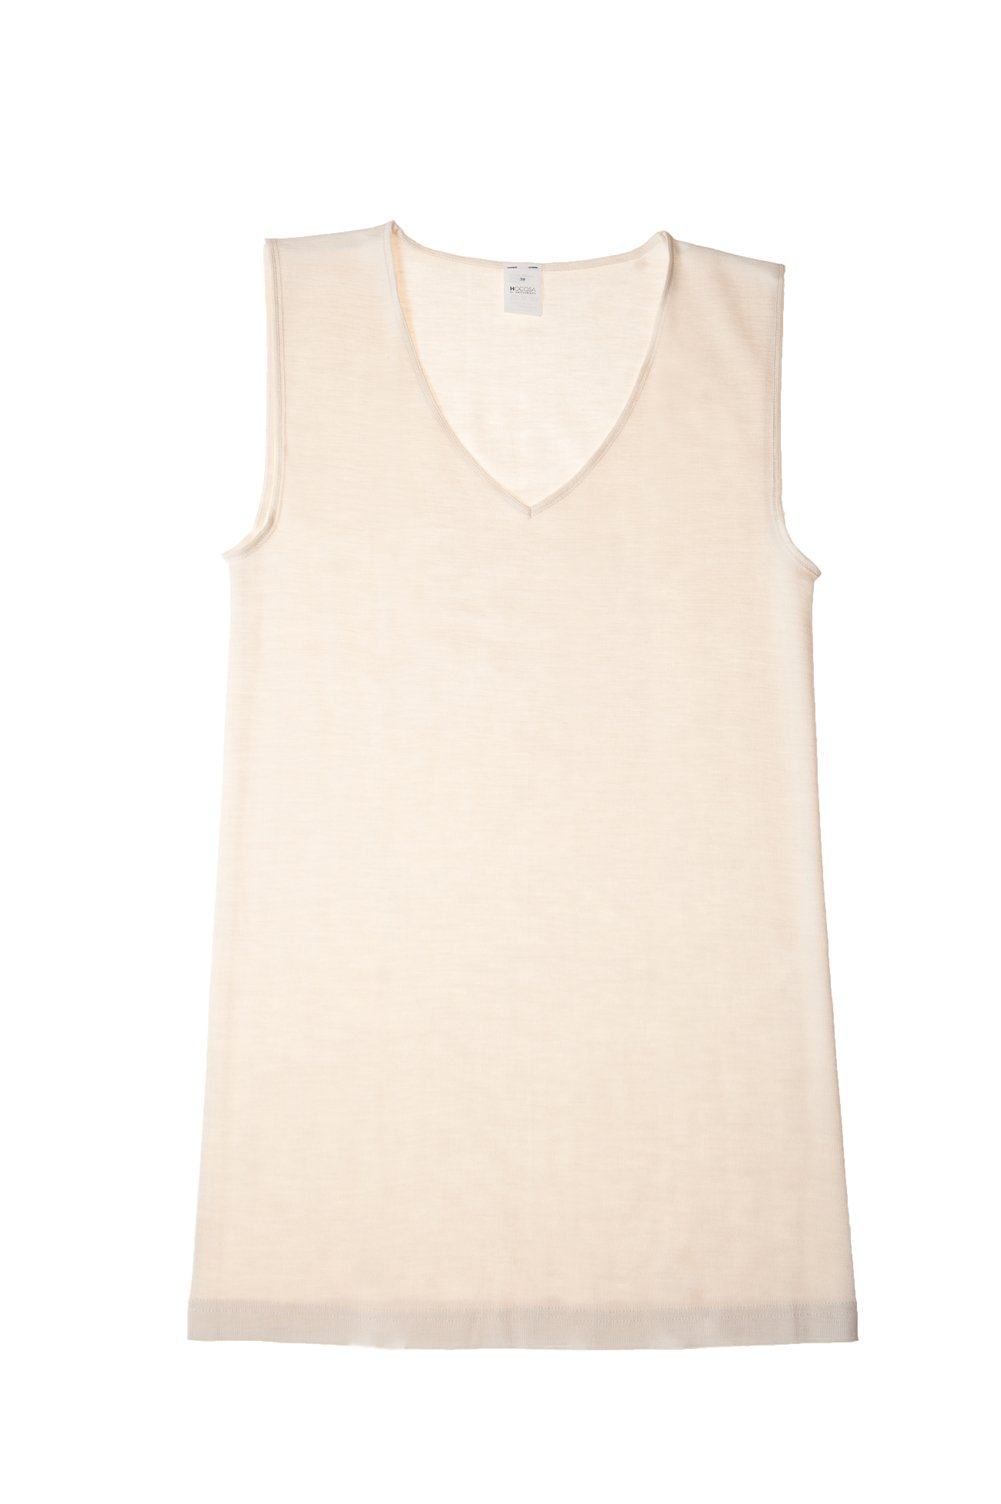 Hocosa Organic Wool-Silk Underwear Shirt for Women, White, size 42/US12